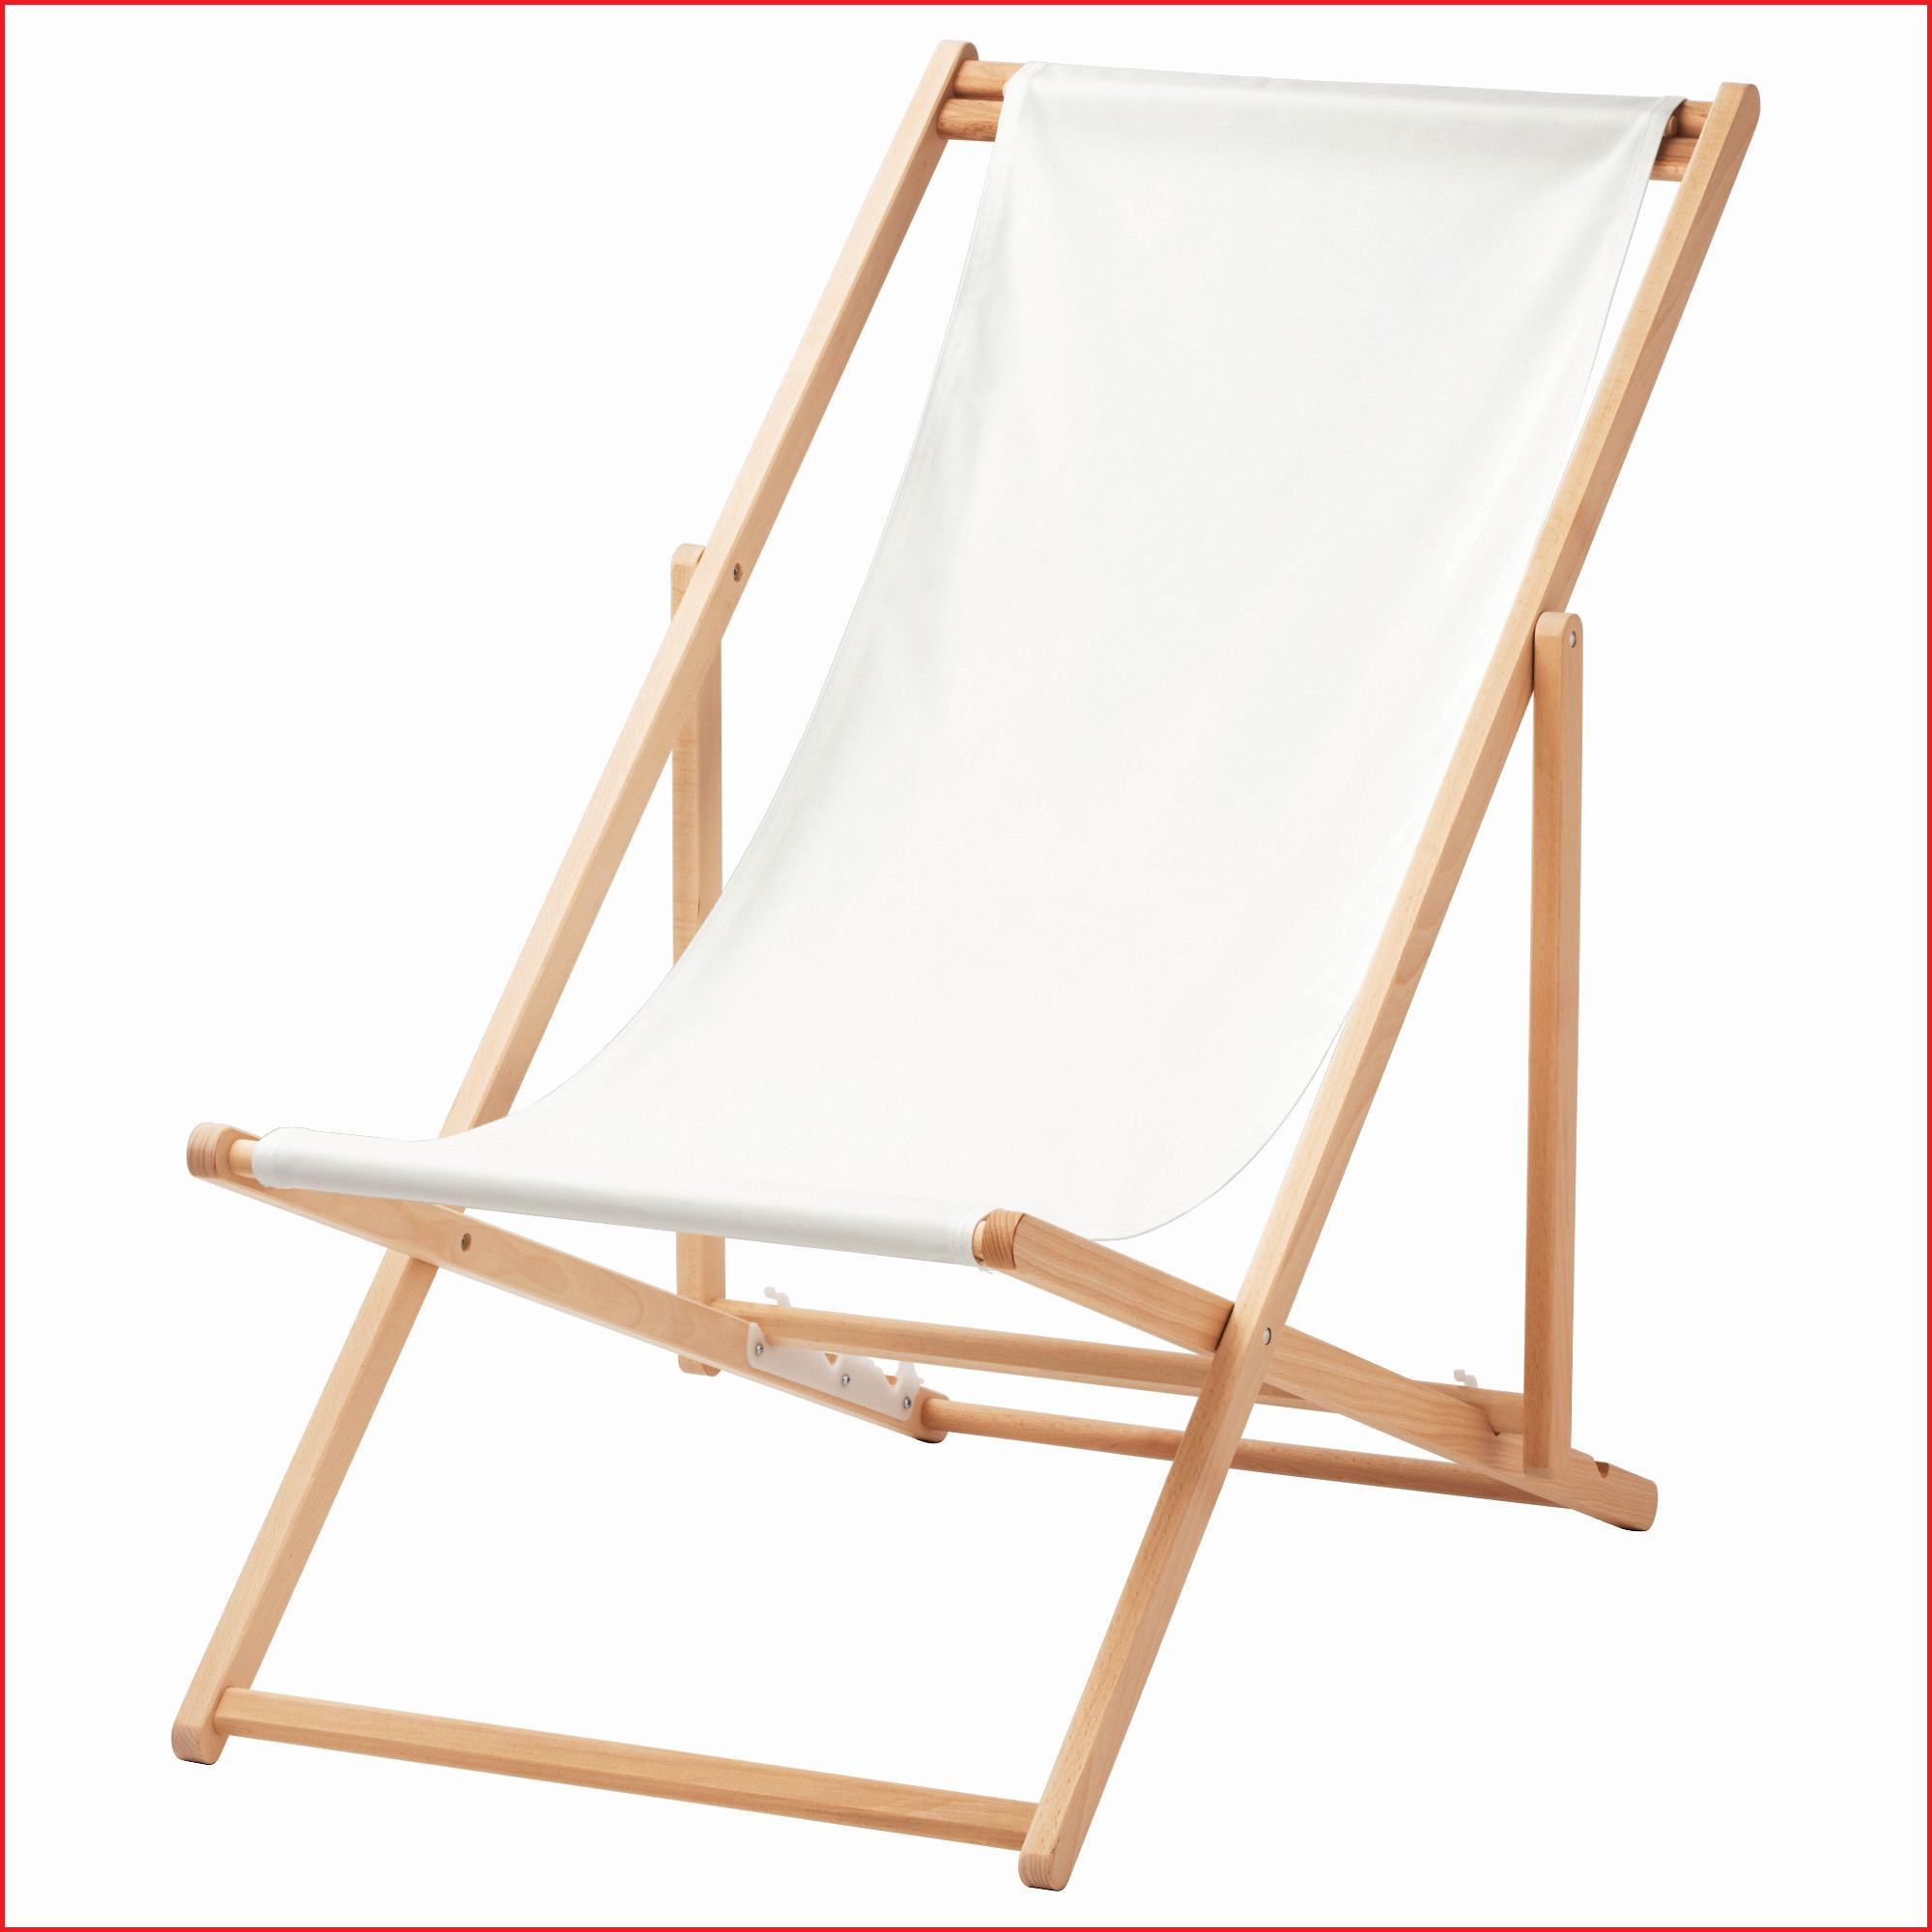 Sillas Playa Ikea Ipdd Silla Colgante Ikea 18 Lo Mejor De Sillas De Playa Ikea Ideas